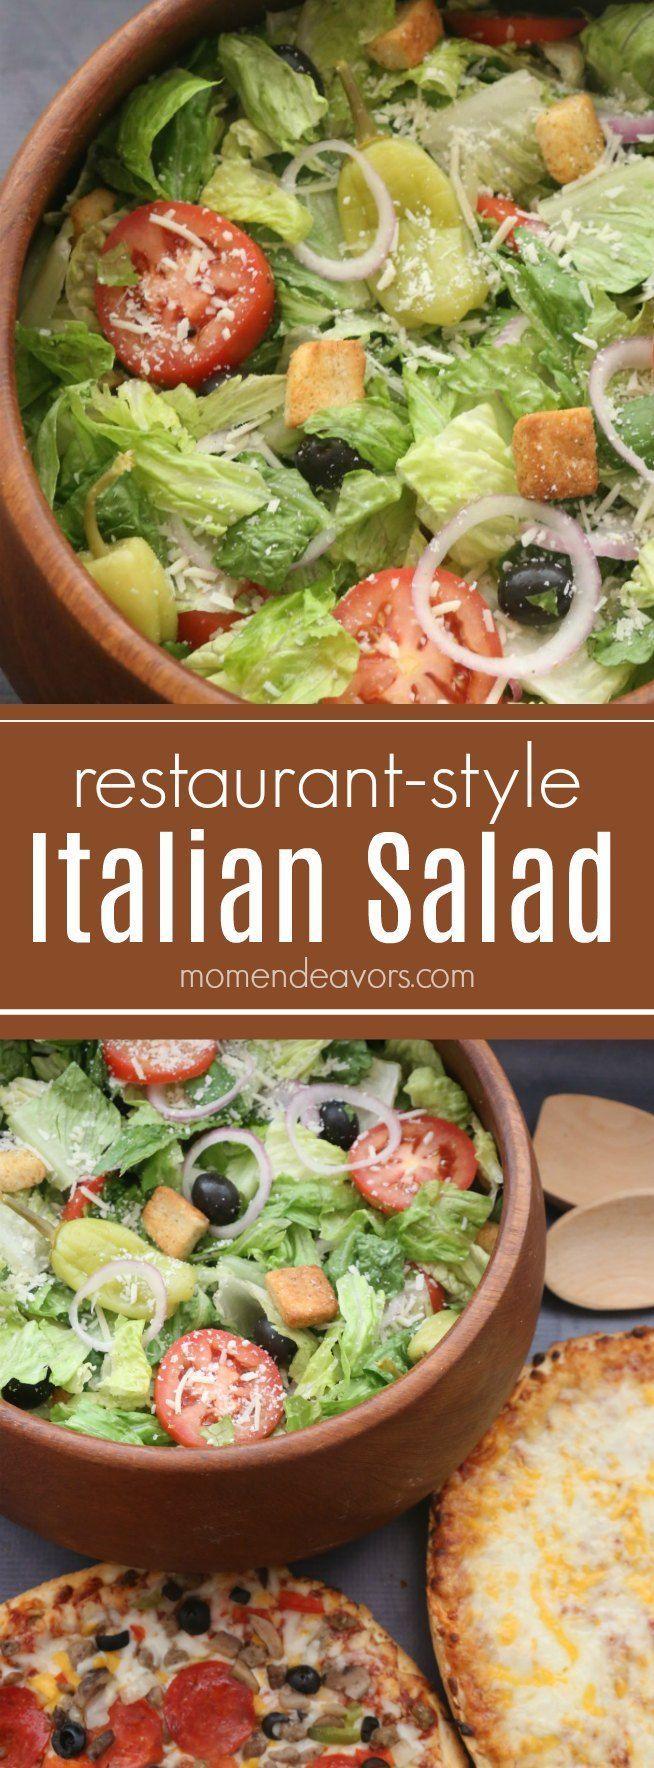 Easy Restaurant-Style Italian Salad Recipe – pairs…